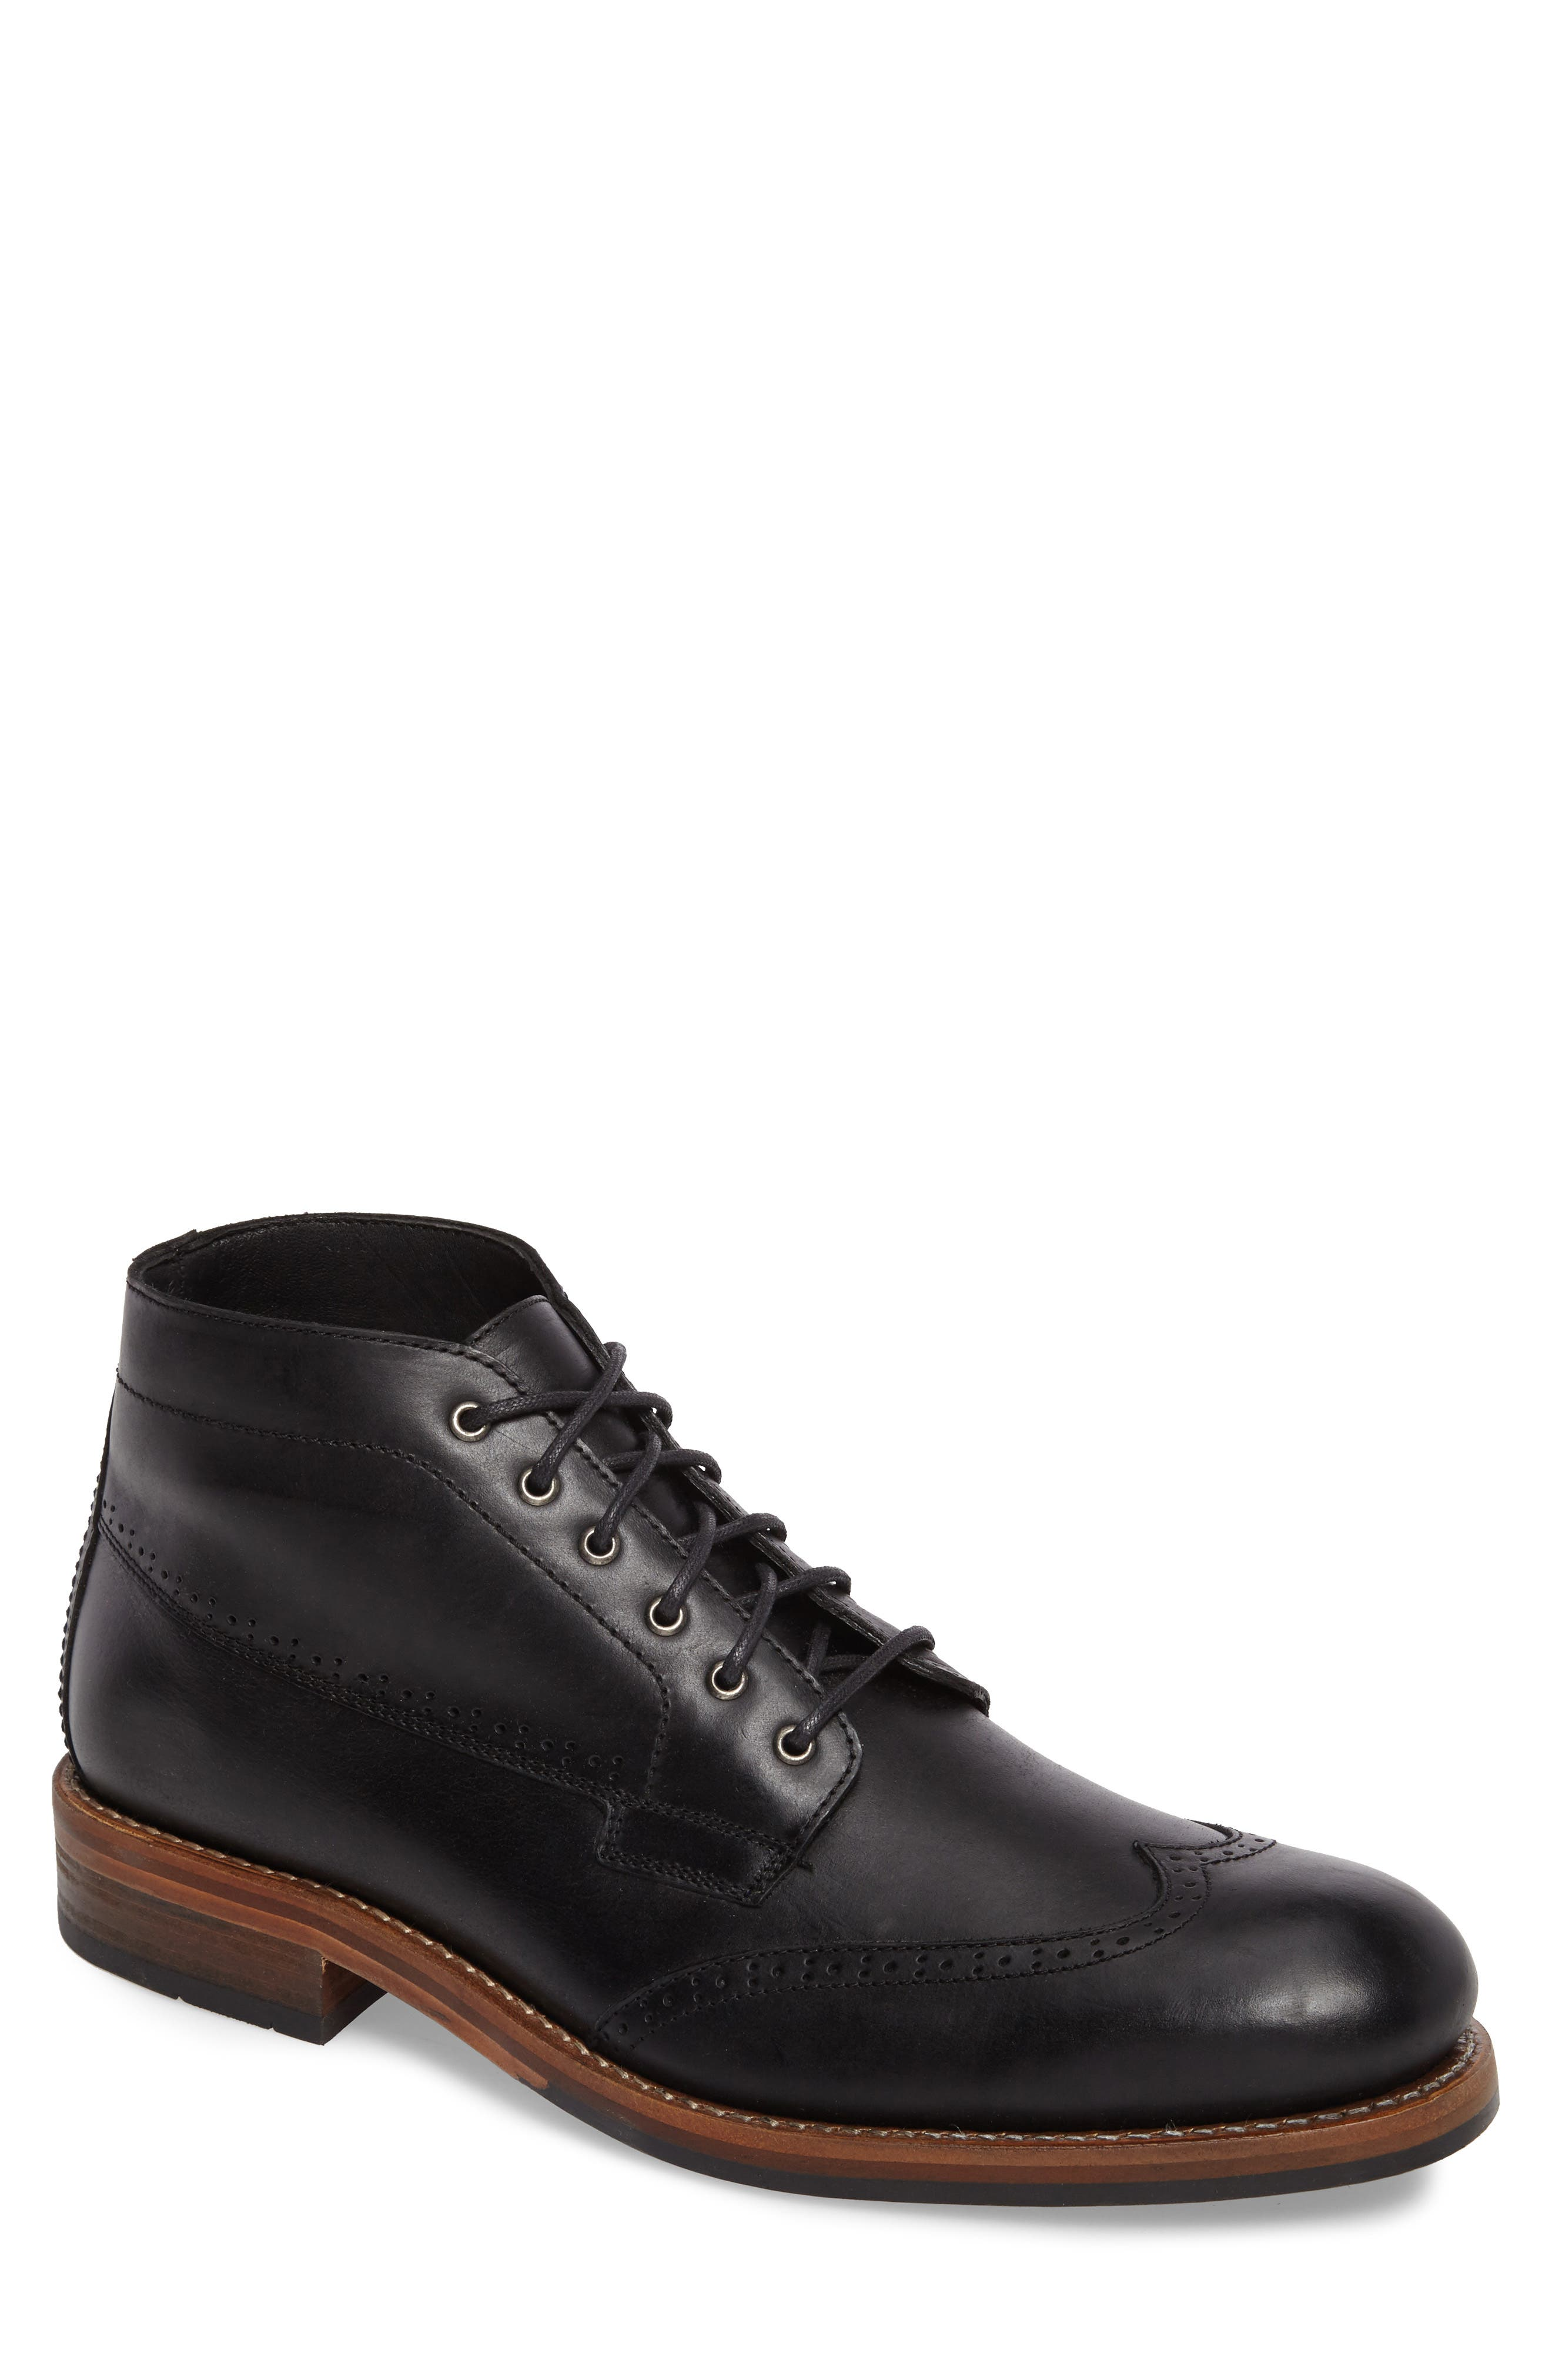 Harwell Wingtip Boot,                             Main thumbnail 1, color,                             Black